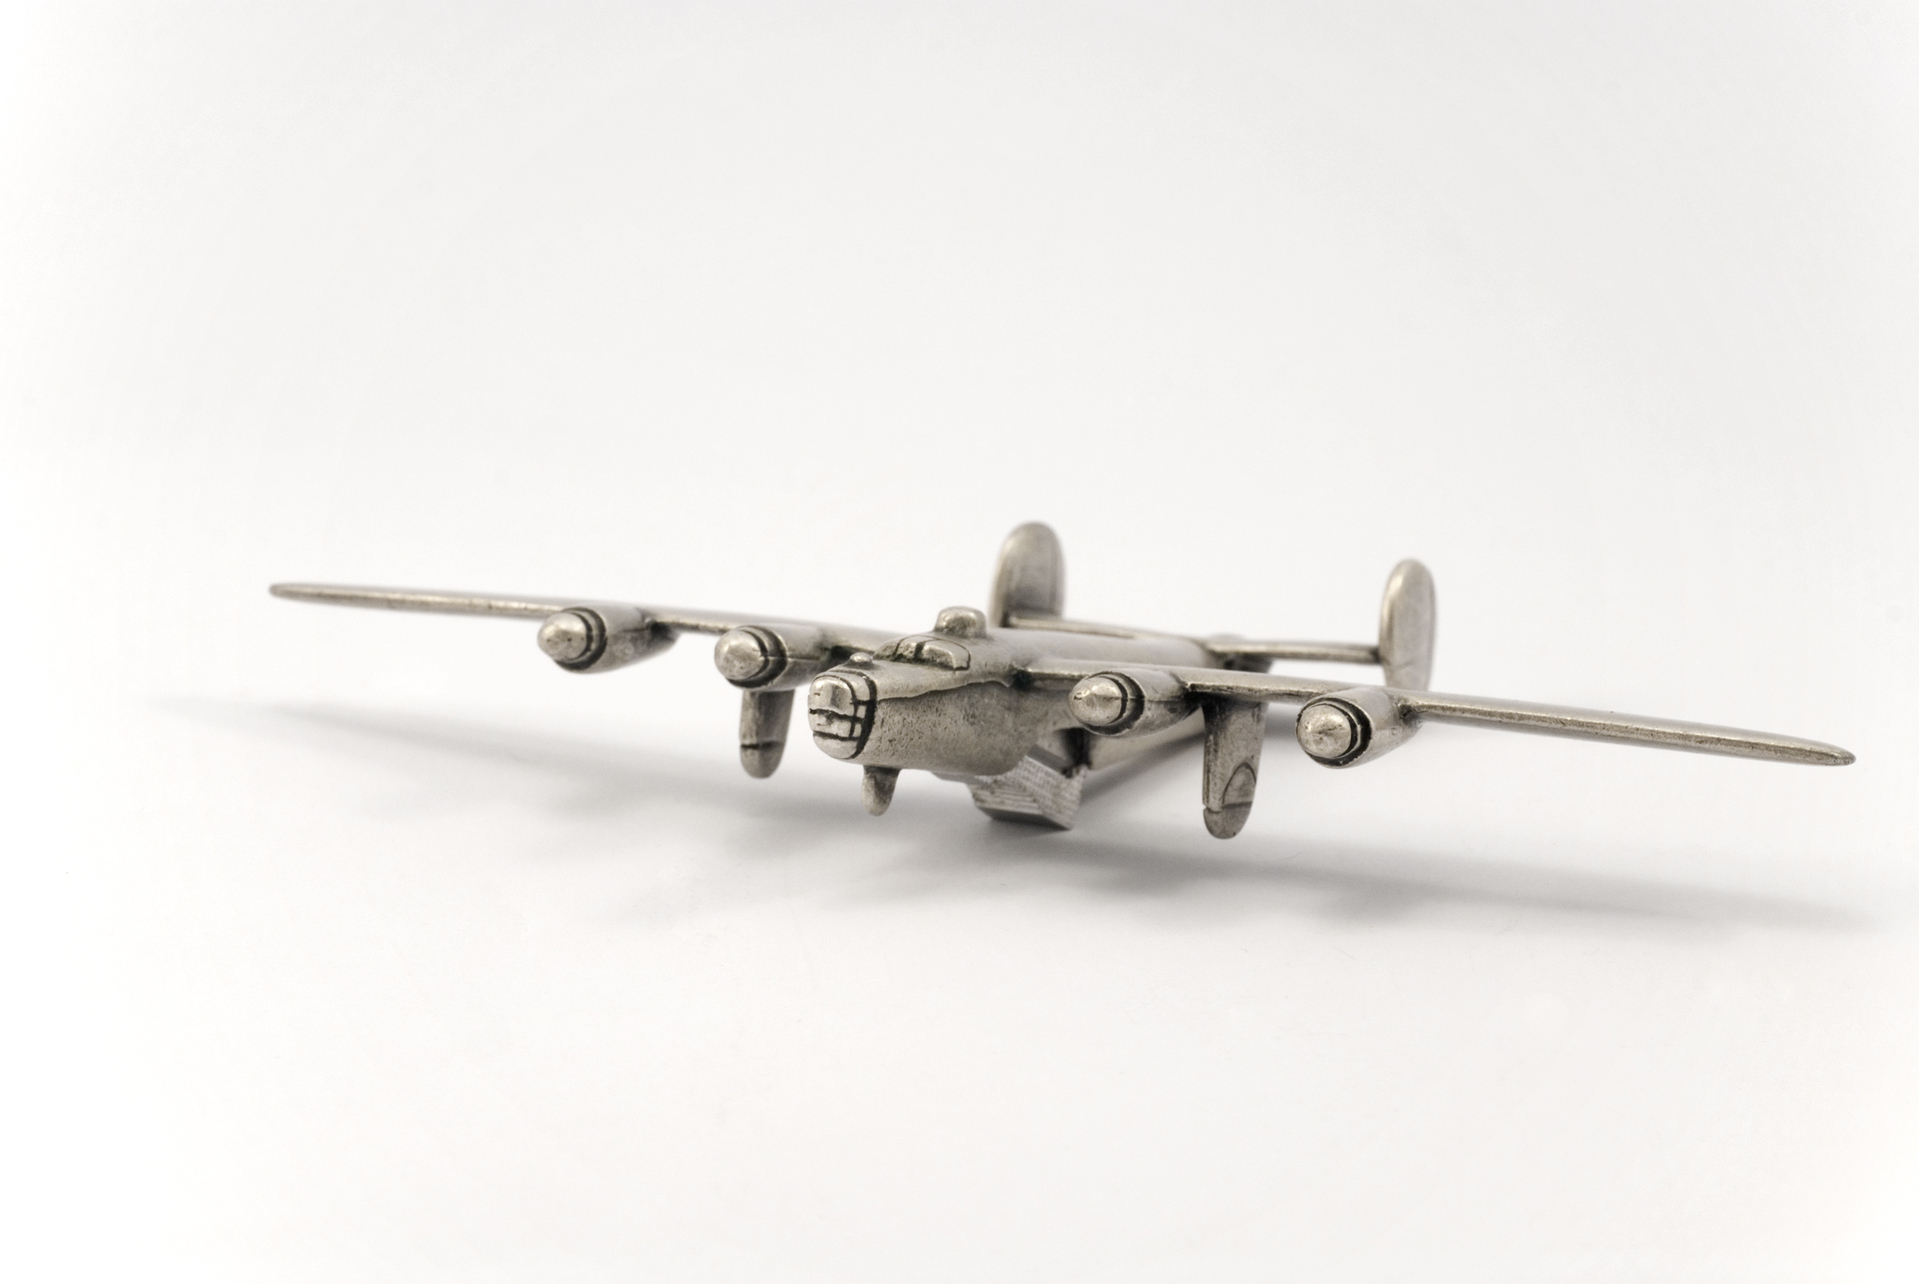 little-heavy-bomber-2-1308289-1919x1284